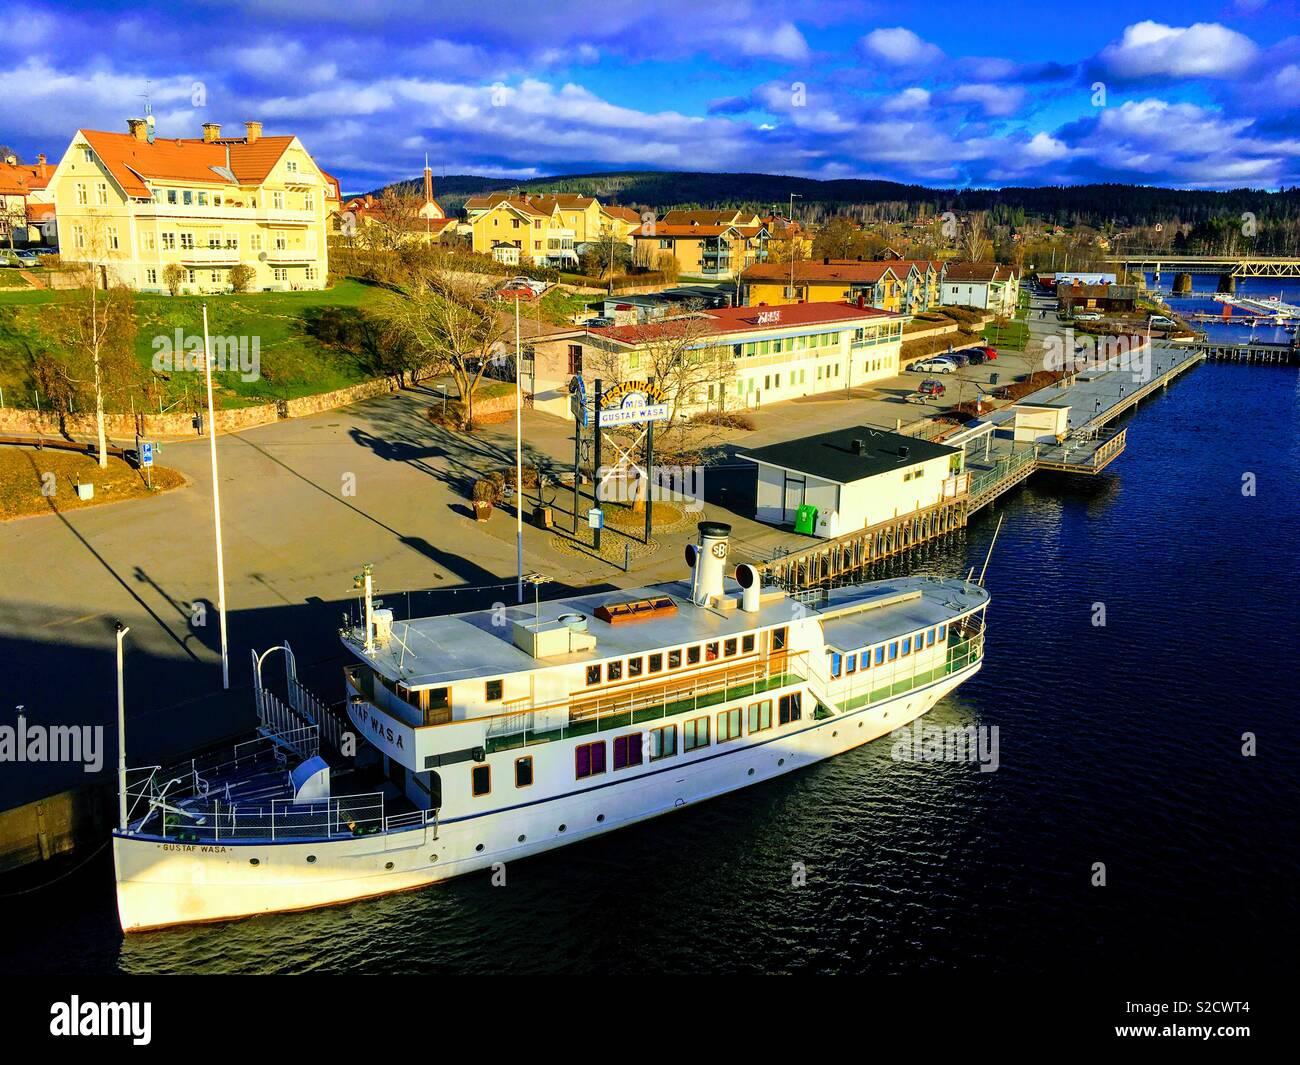 Leksand Dalarna Sweden. - Stock Image